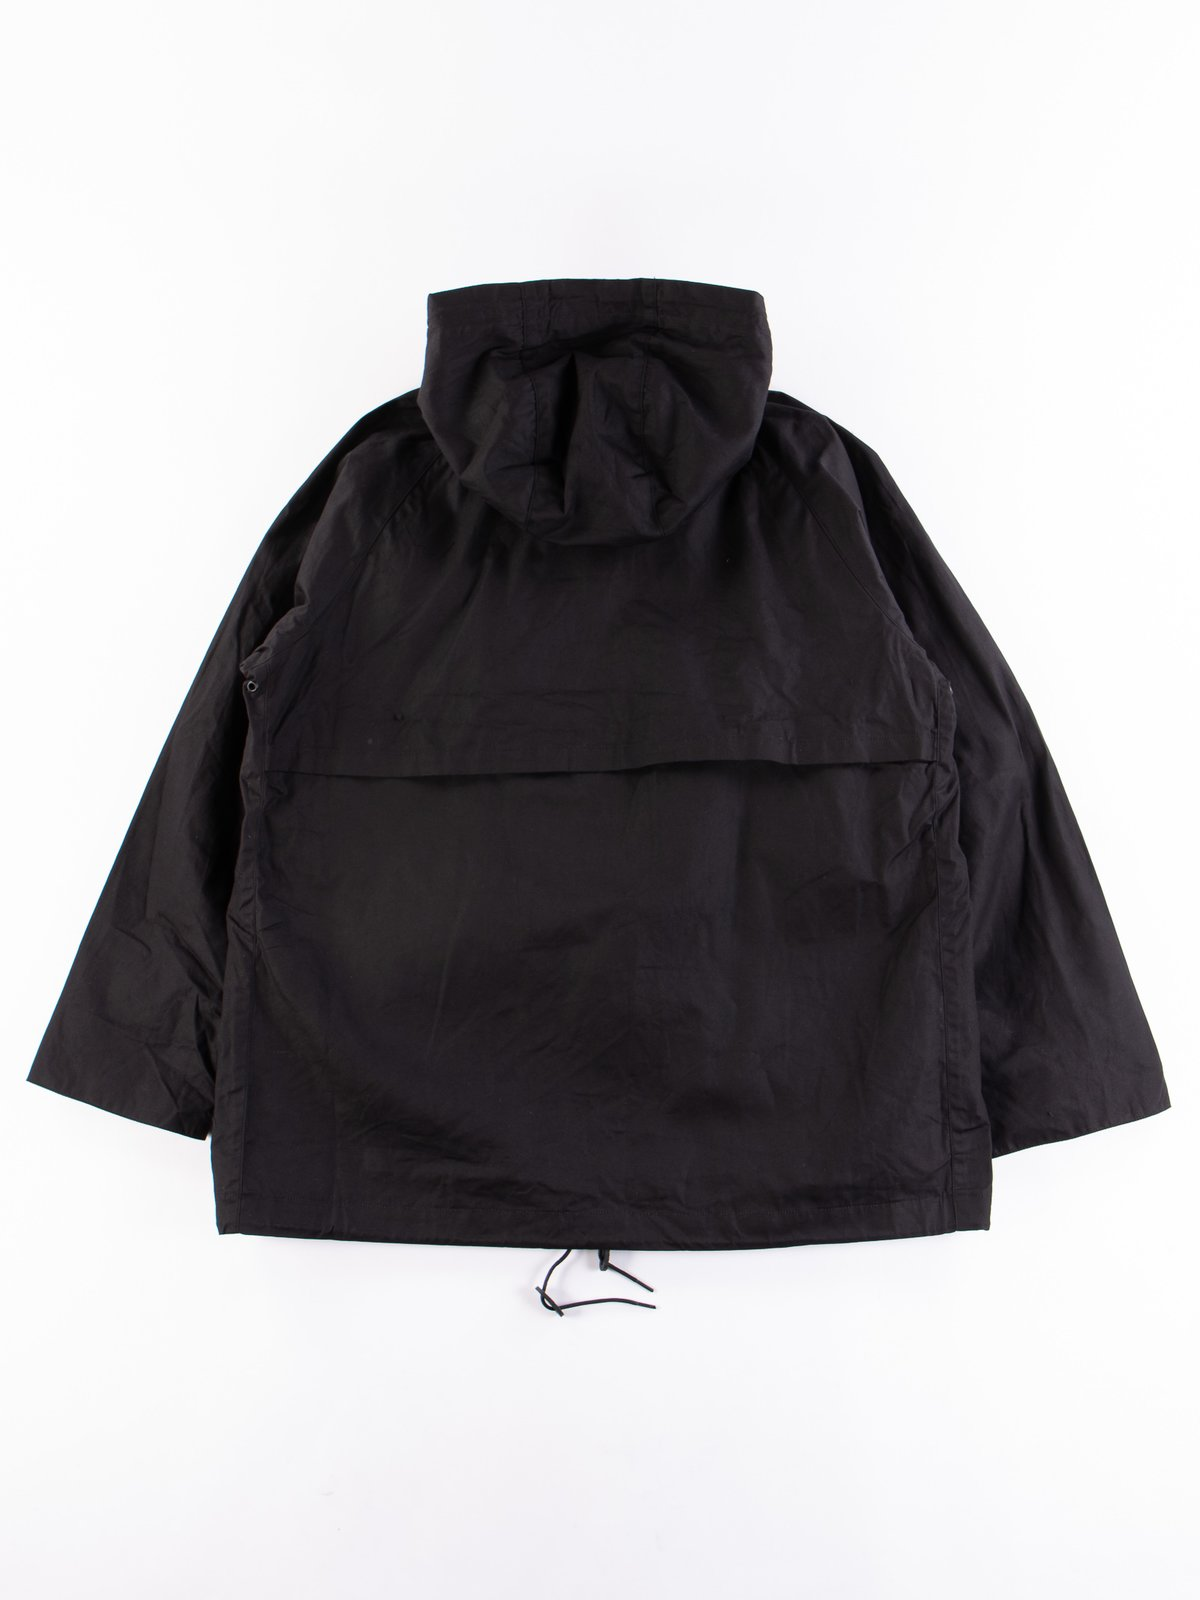 Black British Field Hooded Jacket - Image 5